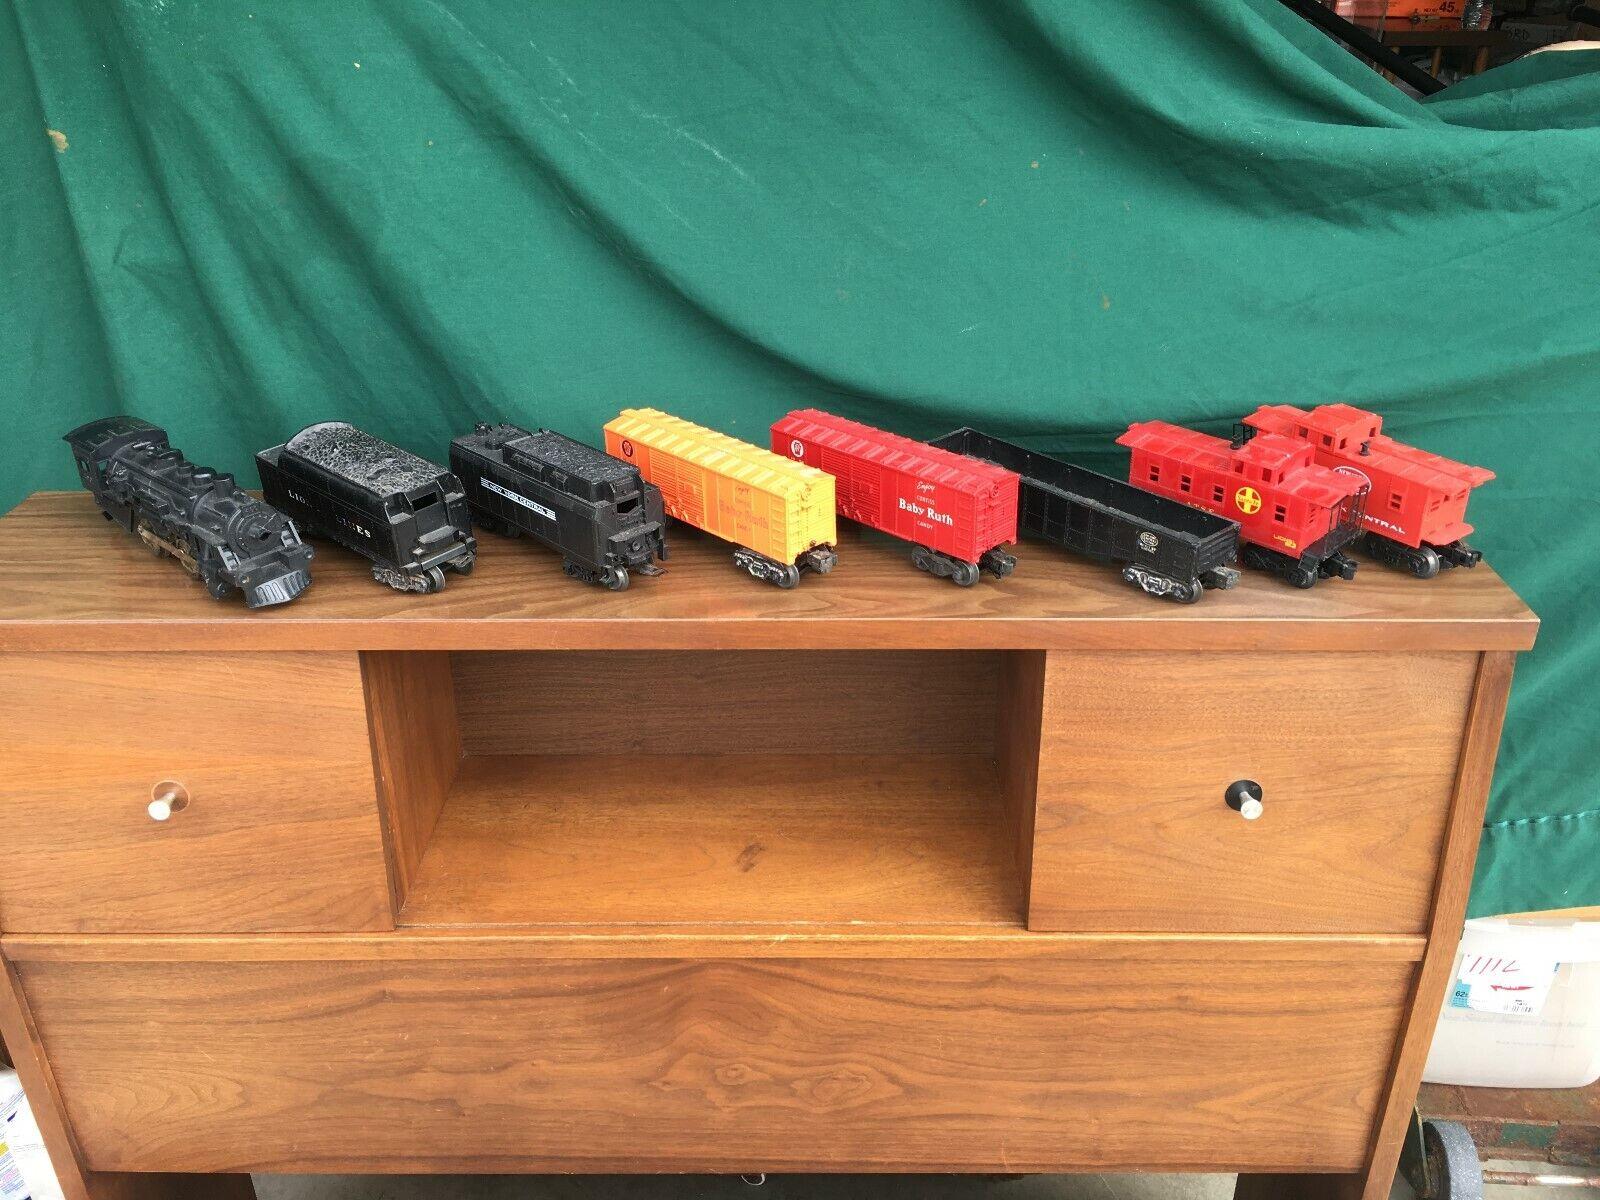 Vtg LIONEL TRAIN Lot NY Central System Santa Fe Baby Ruth Candy Model Railroad